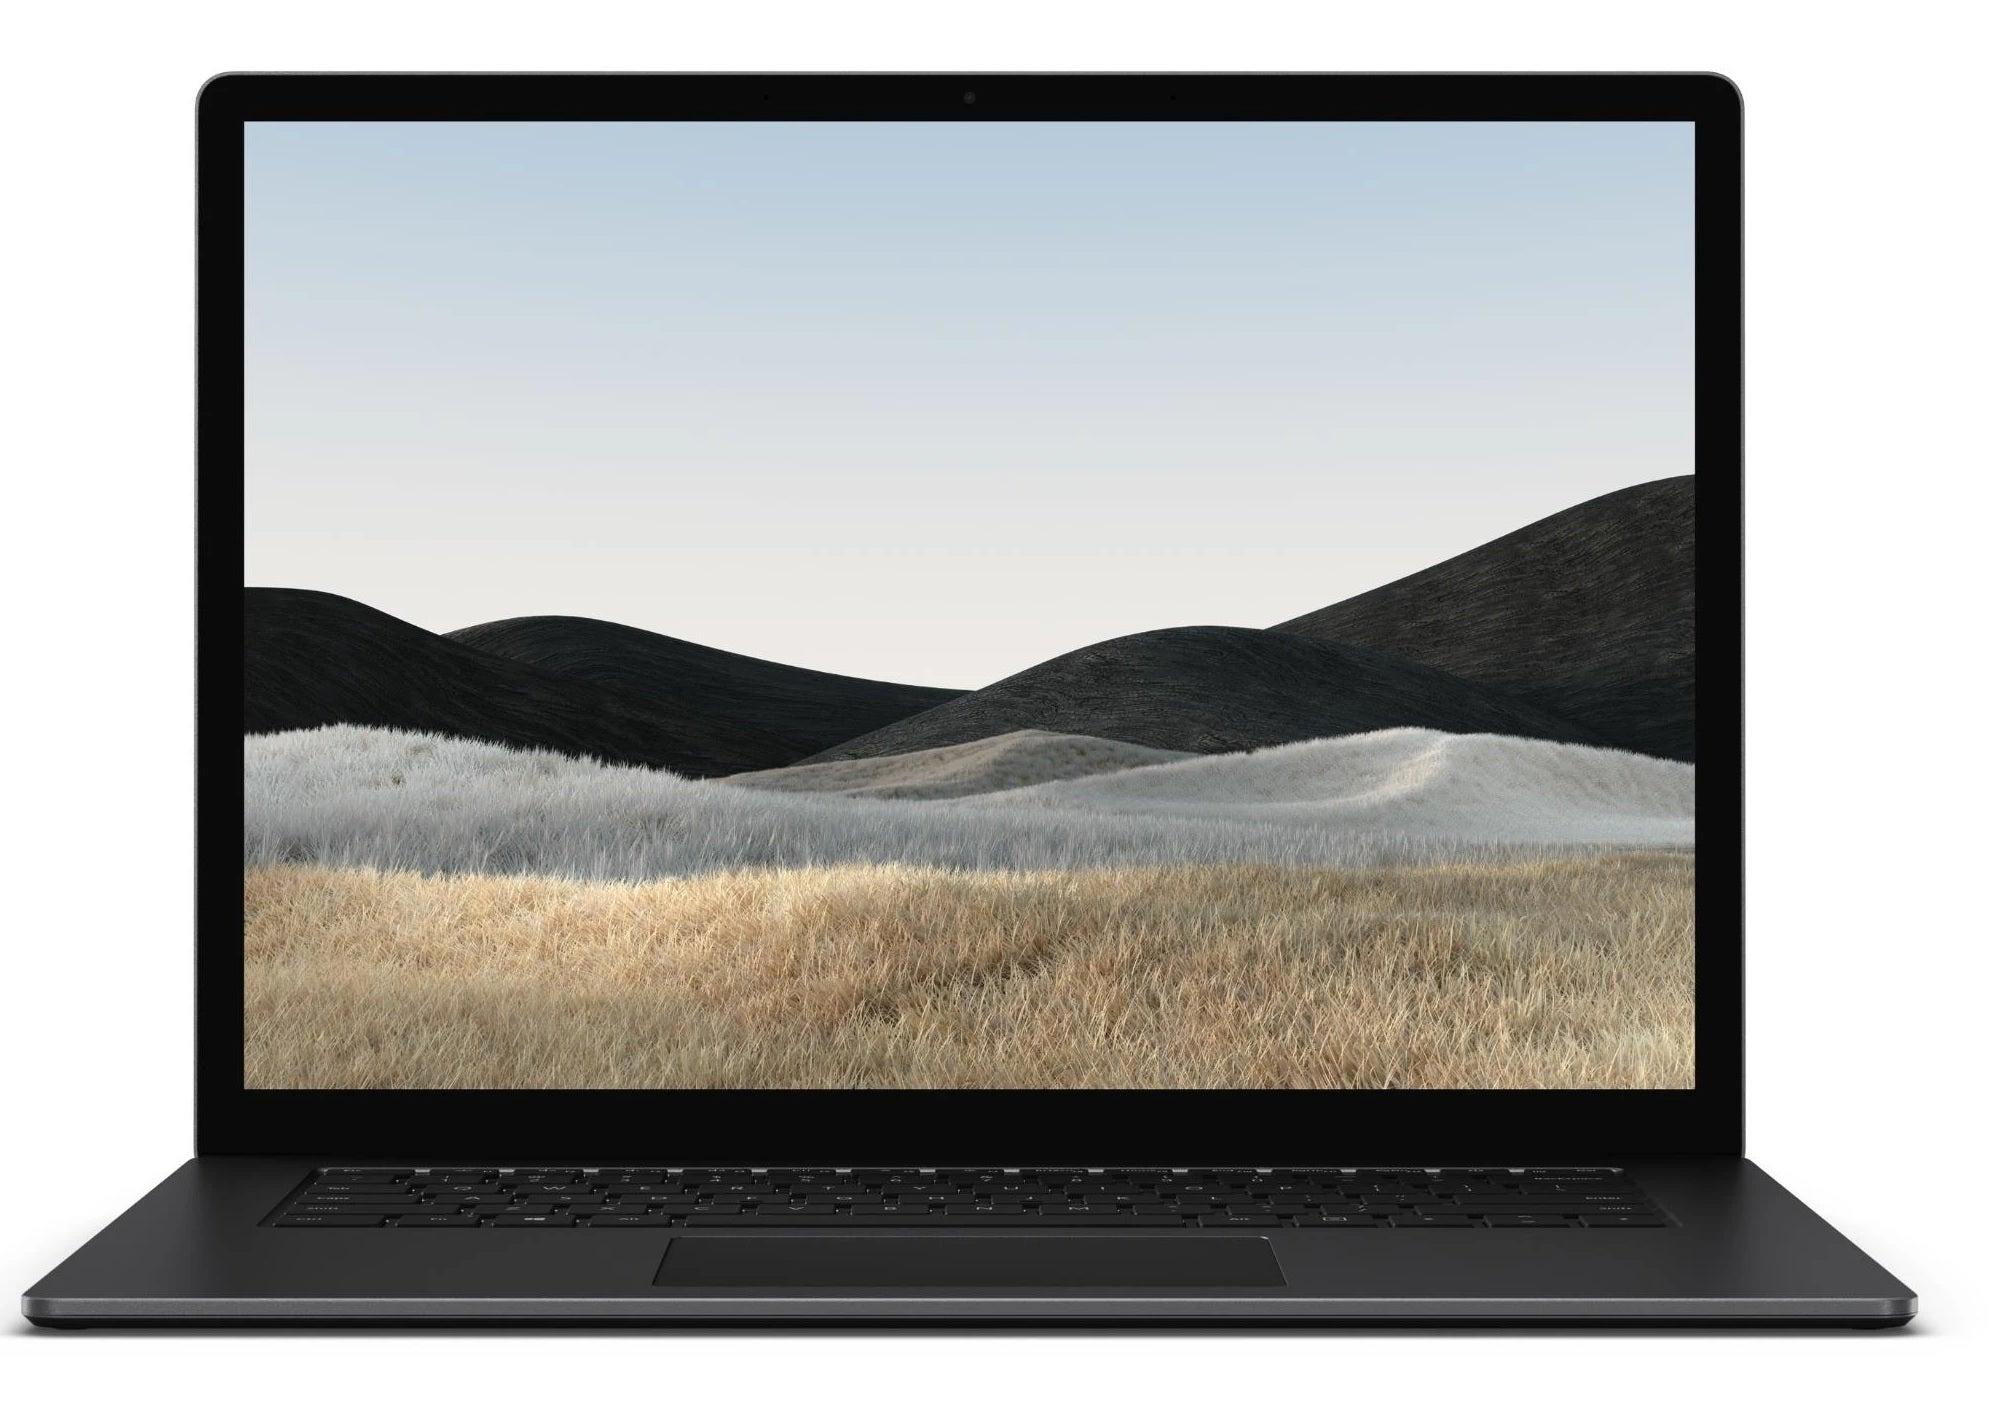 Microsoft Surface Laptop 4 15 inch Laptop